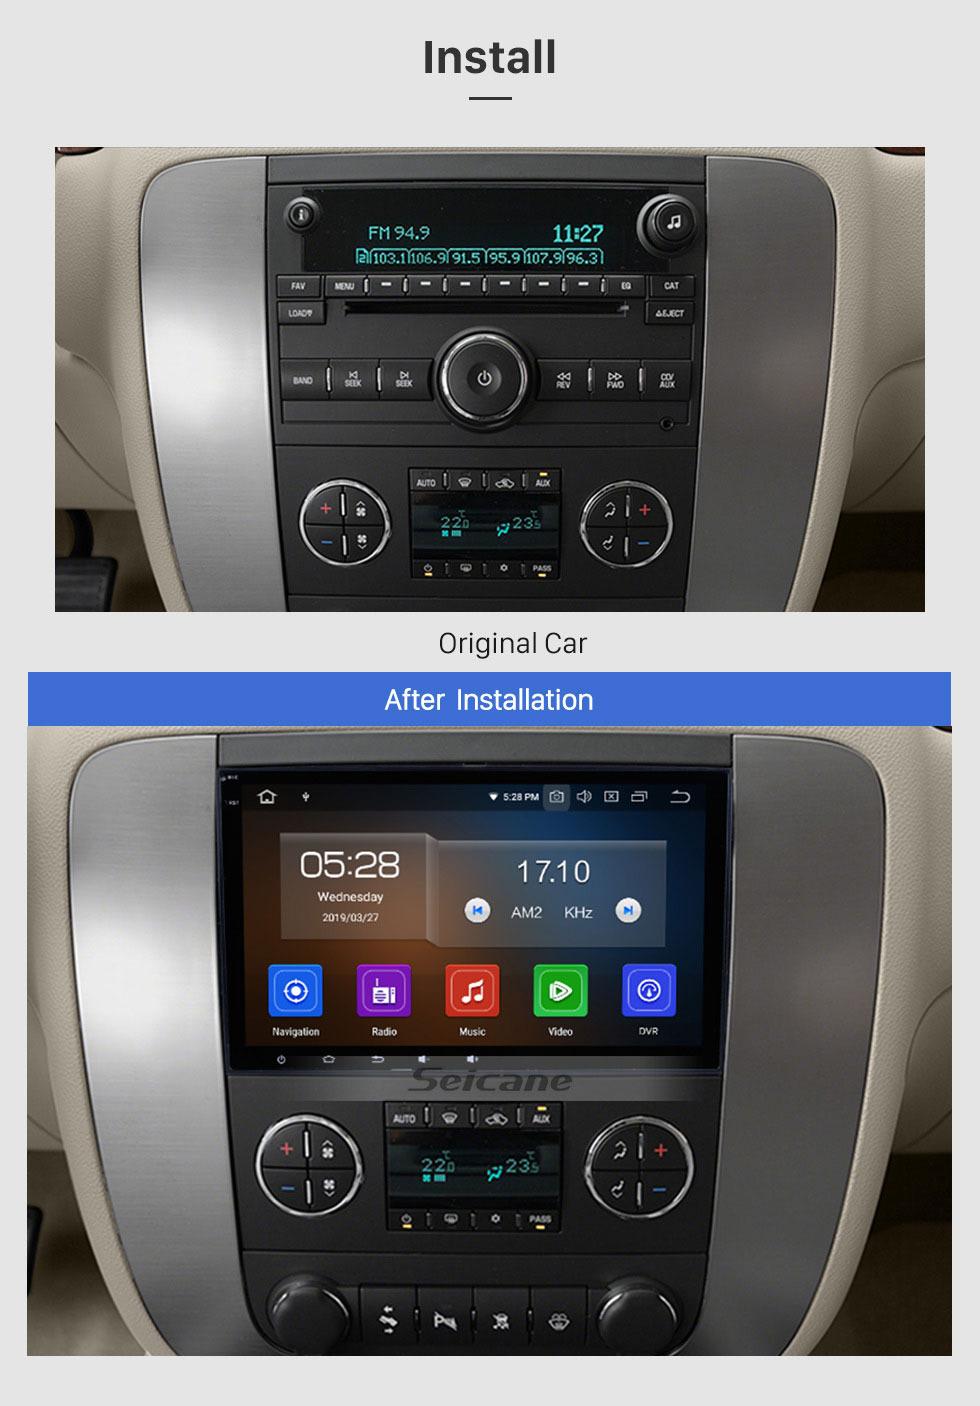 Seicane Android 9.0 2007 2008 2009 2010 2011 GMC Yukon 8 Zoll HD Touchscreen Autoradio Hauptgerät GPS Navigation Musik Bluetooth WIFI Unterstützung 1080P Video Backup Kamera Lenkradsteuerung